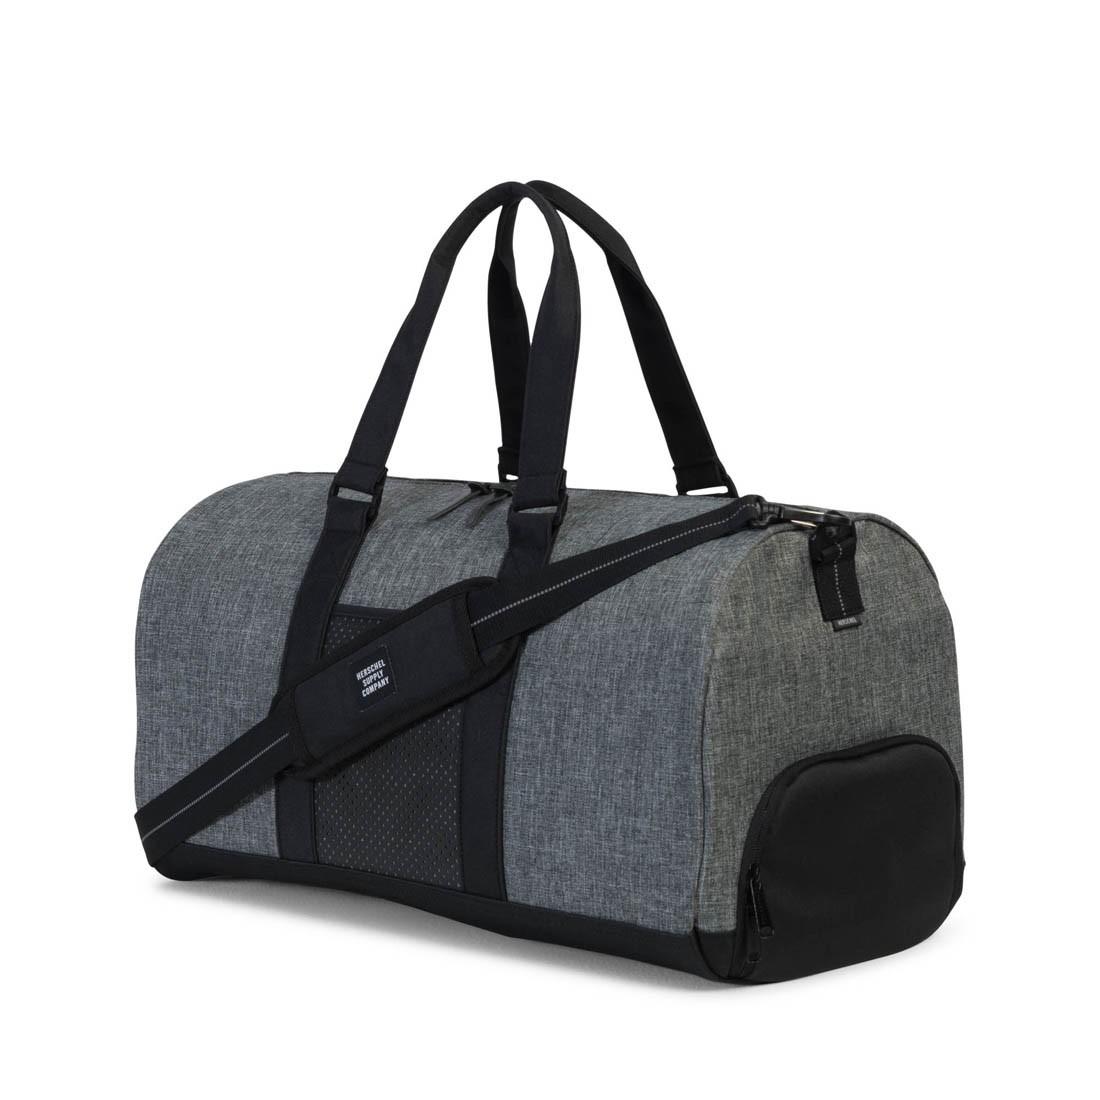 ... Novel Duffle Bag Raven Crosshatch Black. « 2ece6d902b940